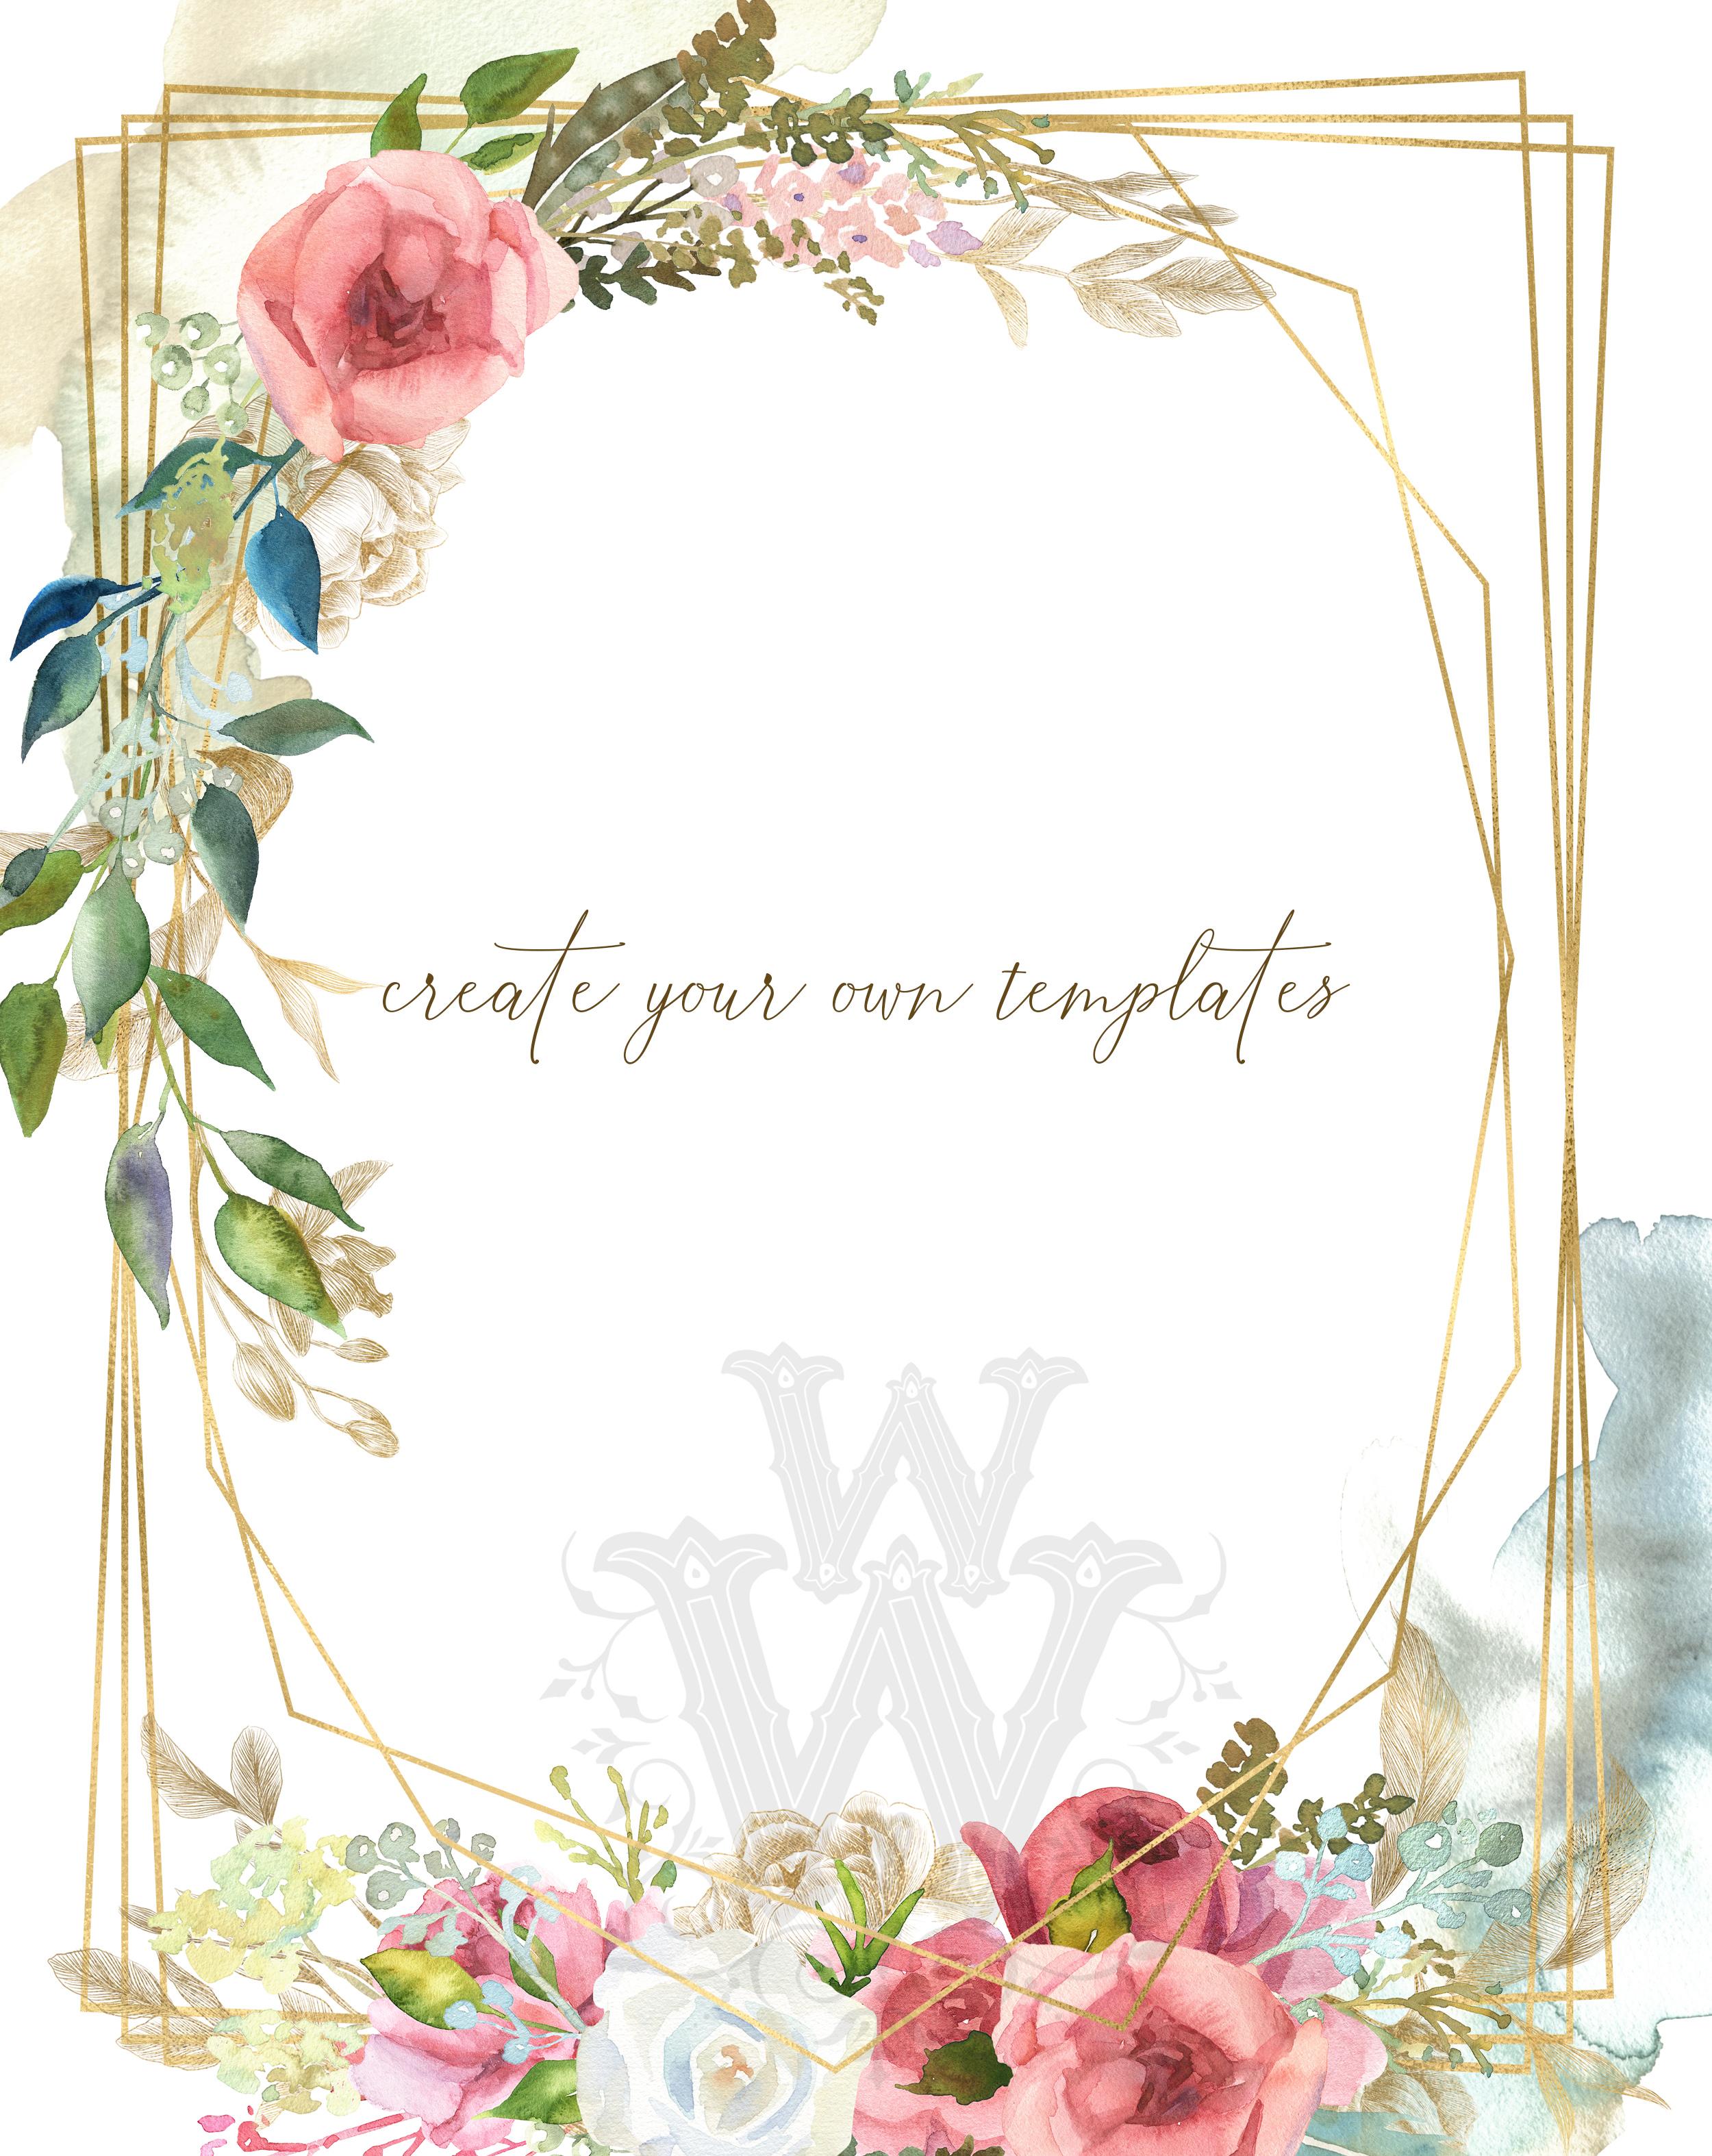 Watercolor rustic wedding bouquets clipart, vintage wreath example image 5